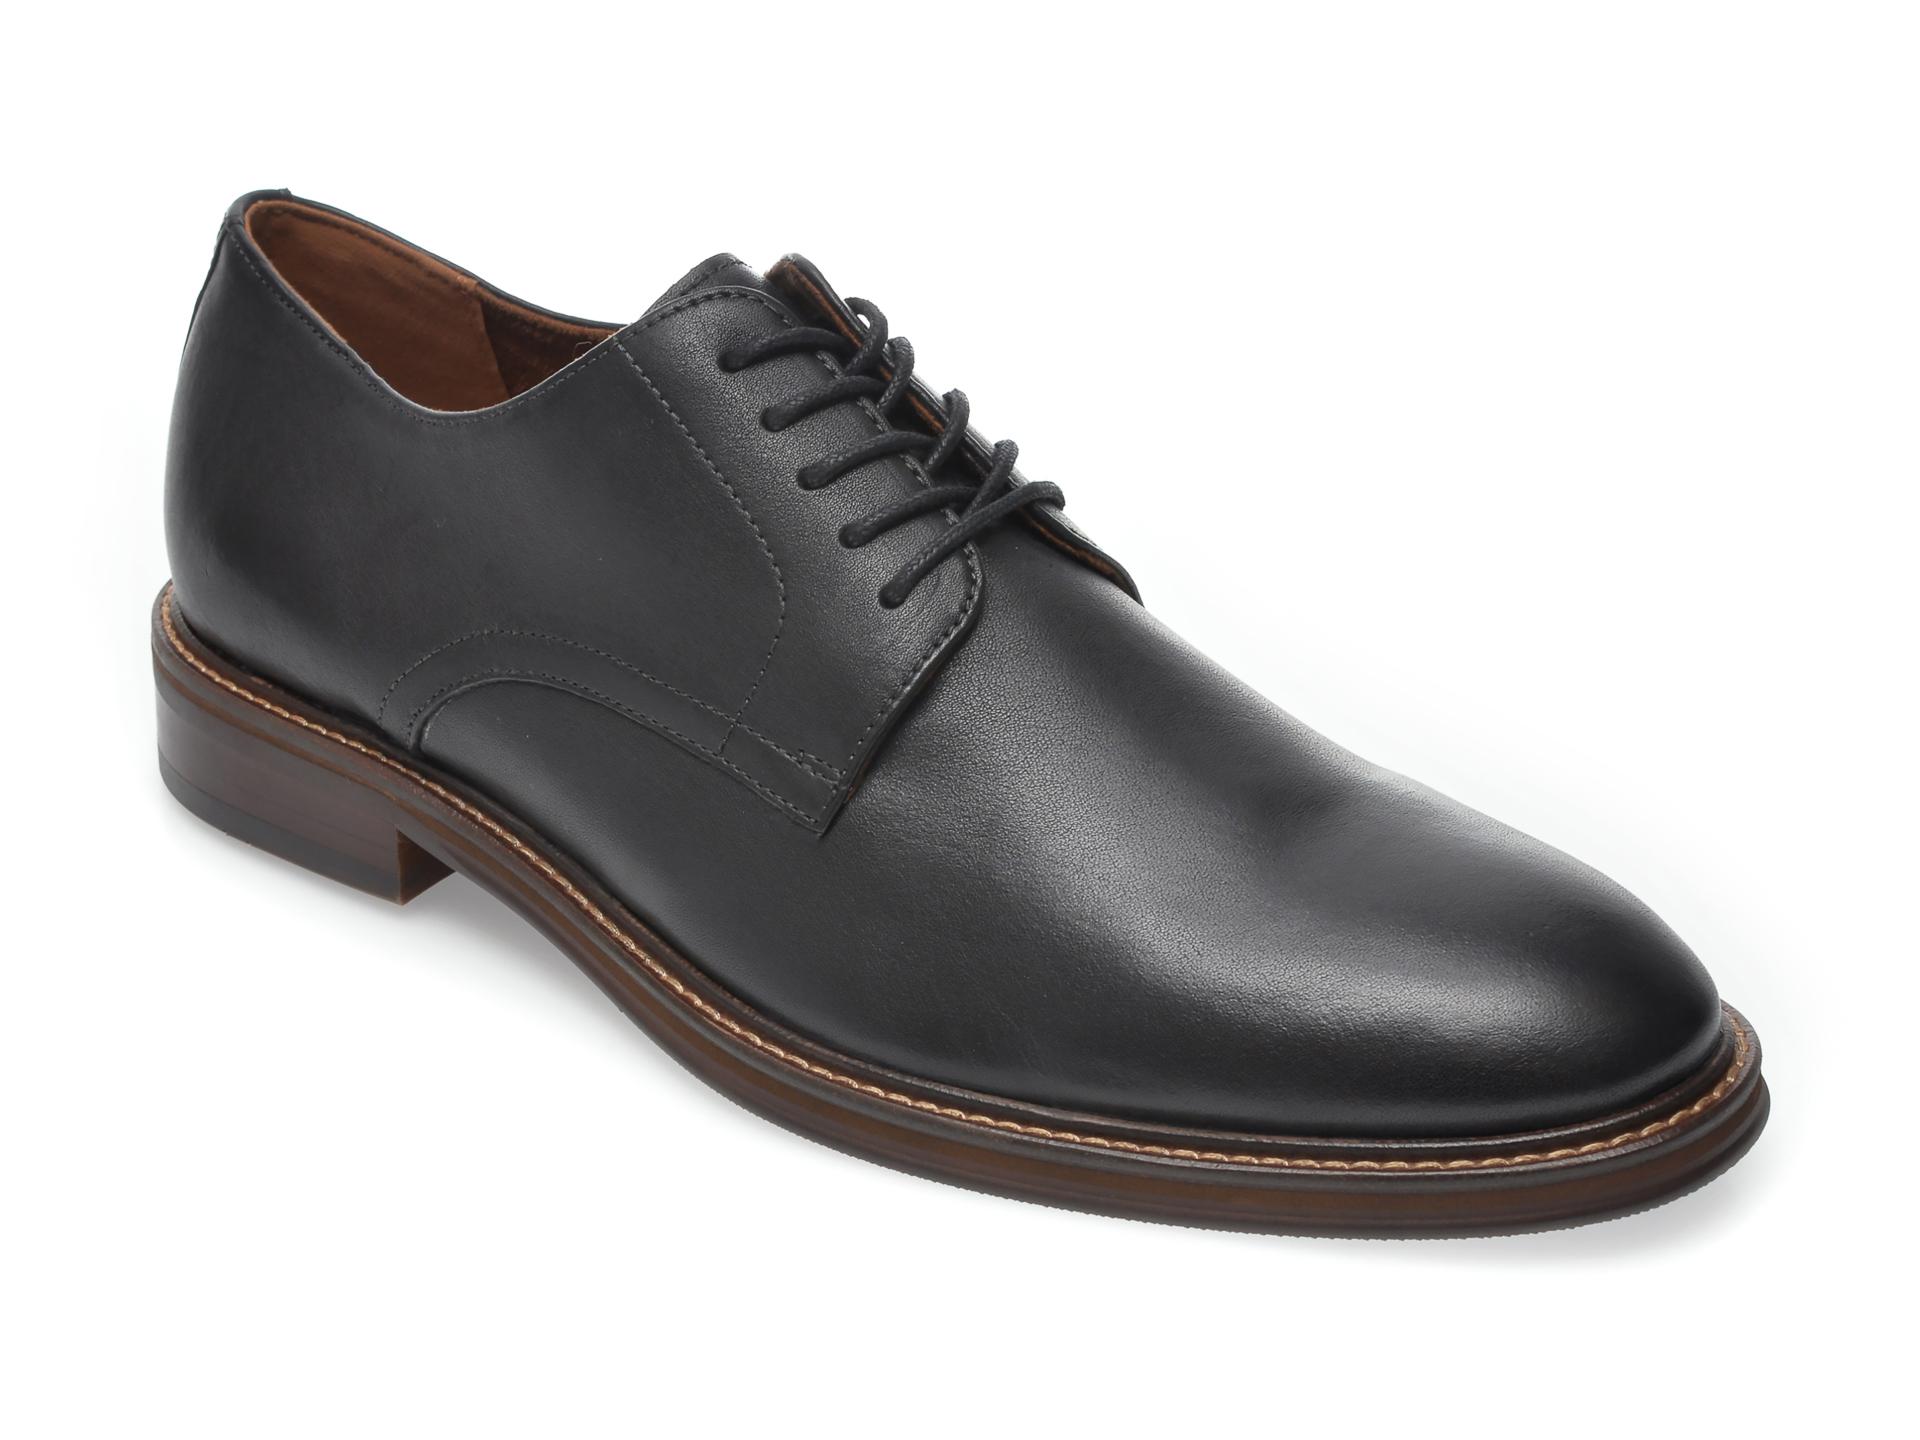 Pantofi ALDO negri, Evan001, din piele naturala imagine